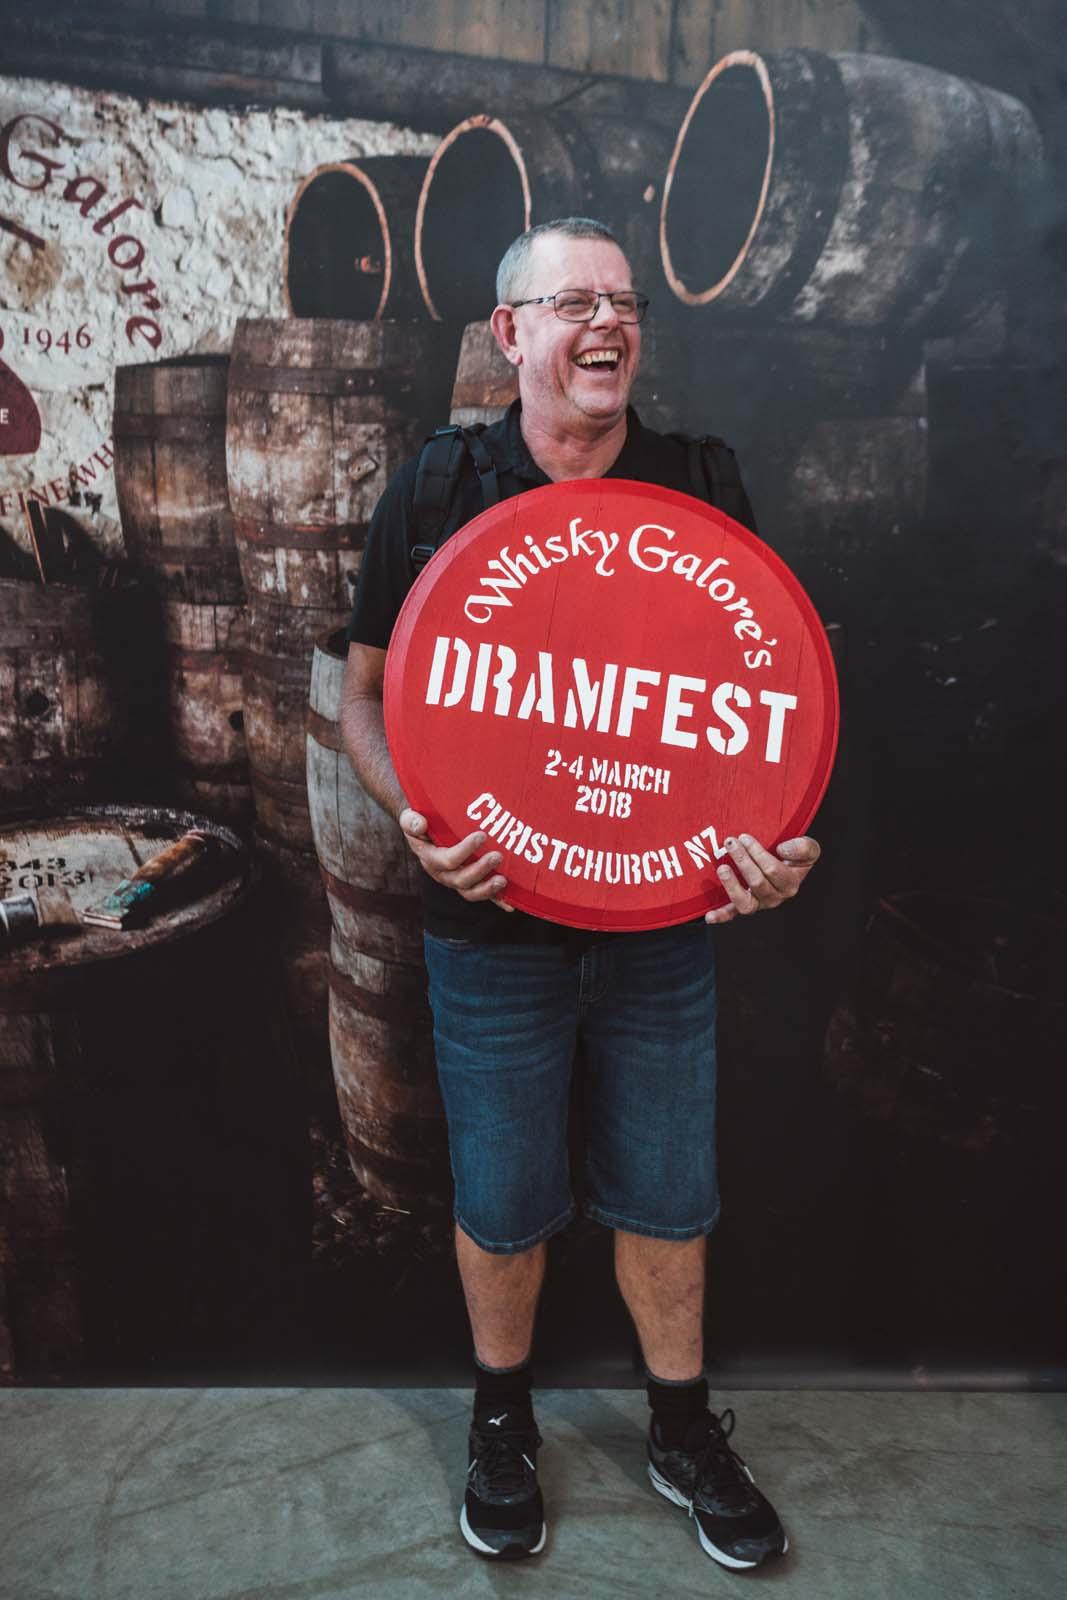 Dramfest 2018 for Whisky Galore-129.jpg